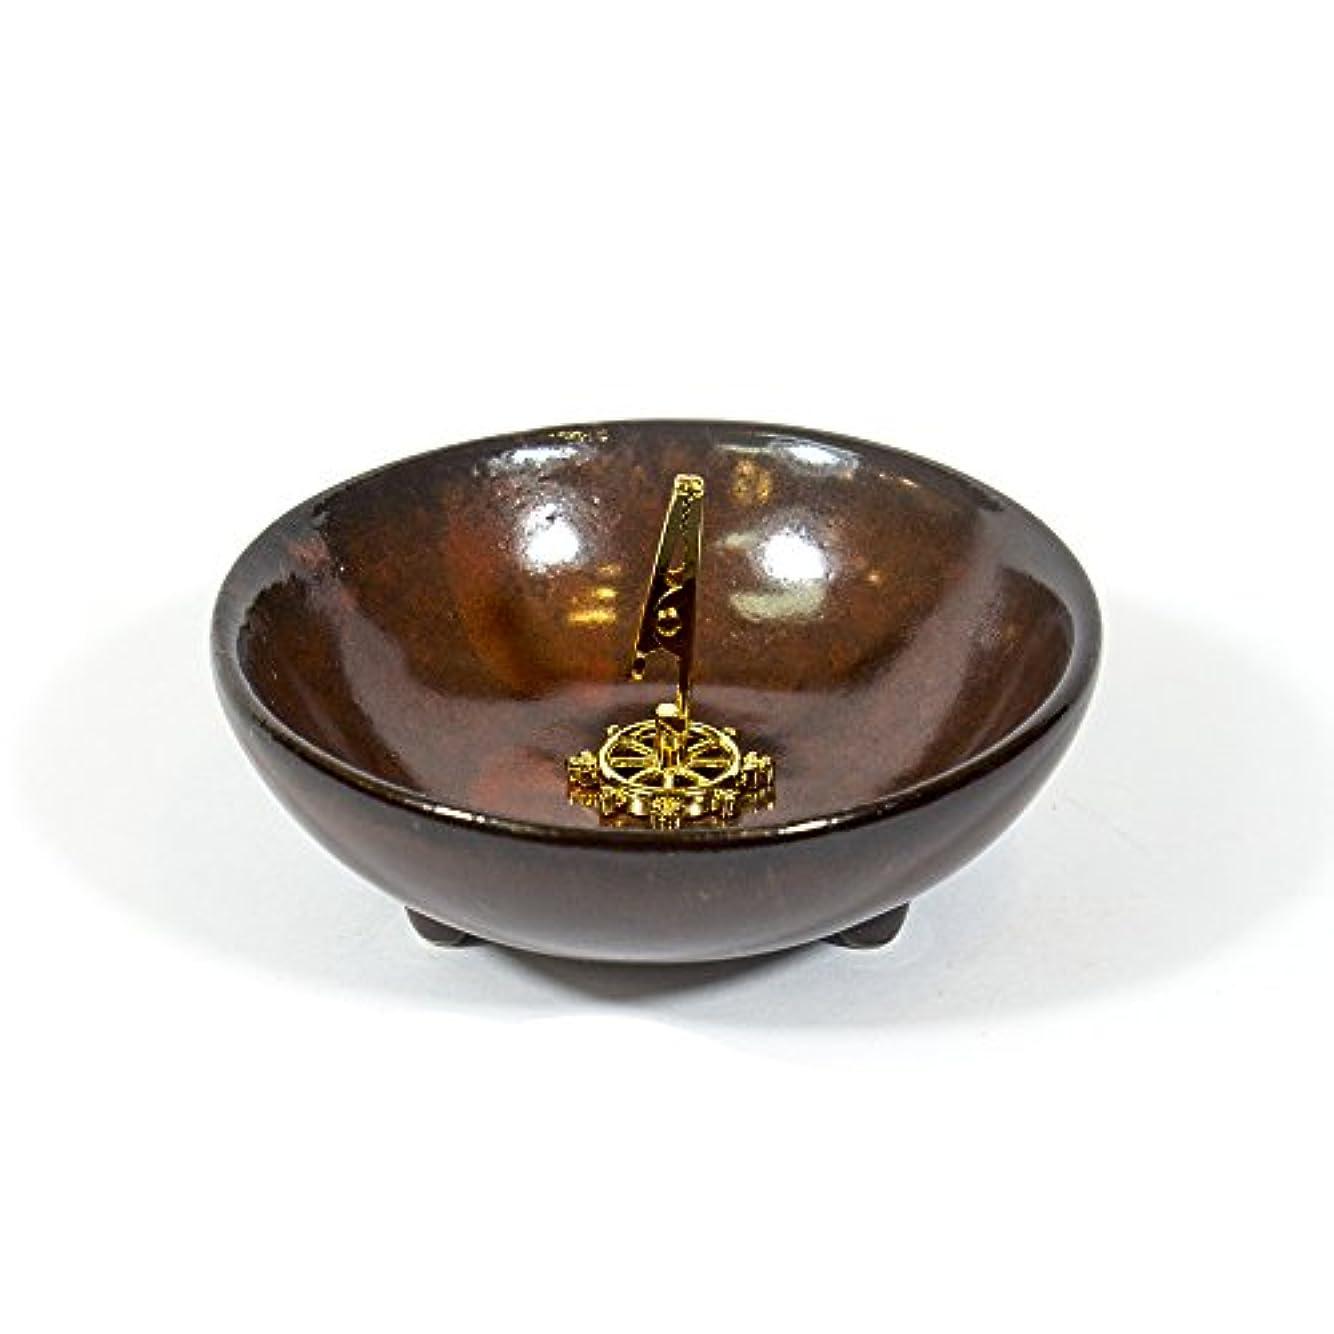 (DarkRed) - Incense Holder for Coils Sticks Cones Ceramic Holder Dark Red Type